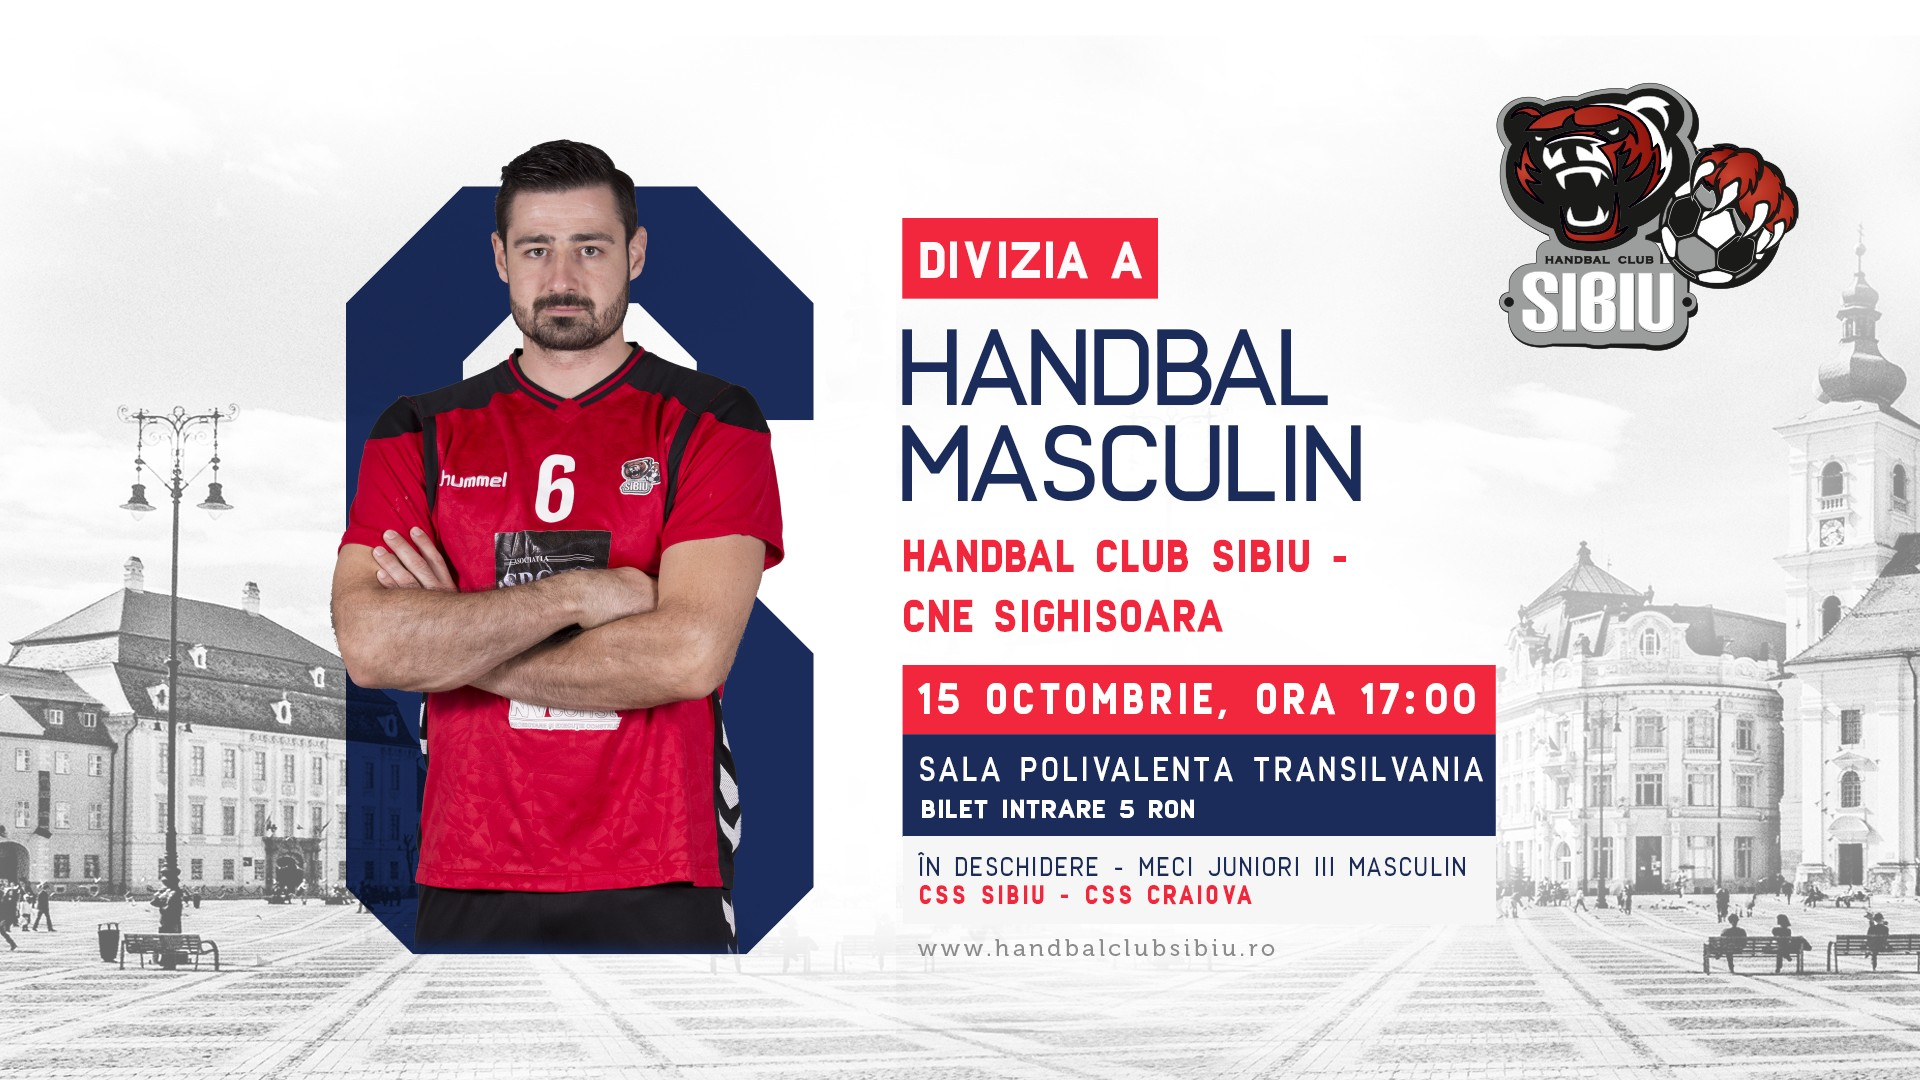 Handbal Club Sibiu - CNE Sighisoara